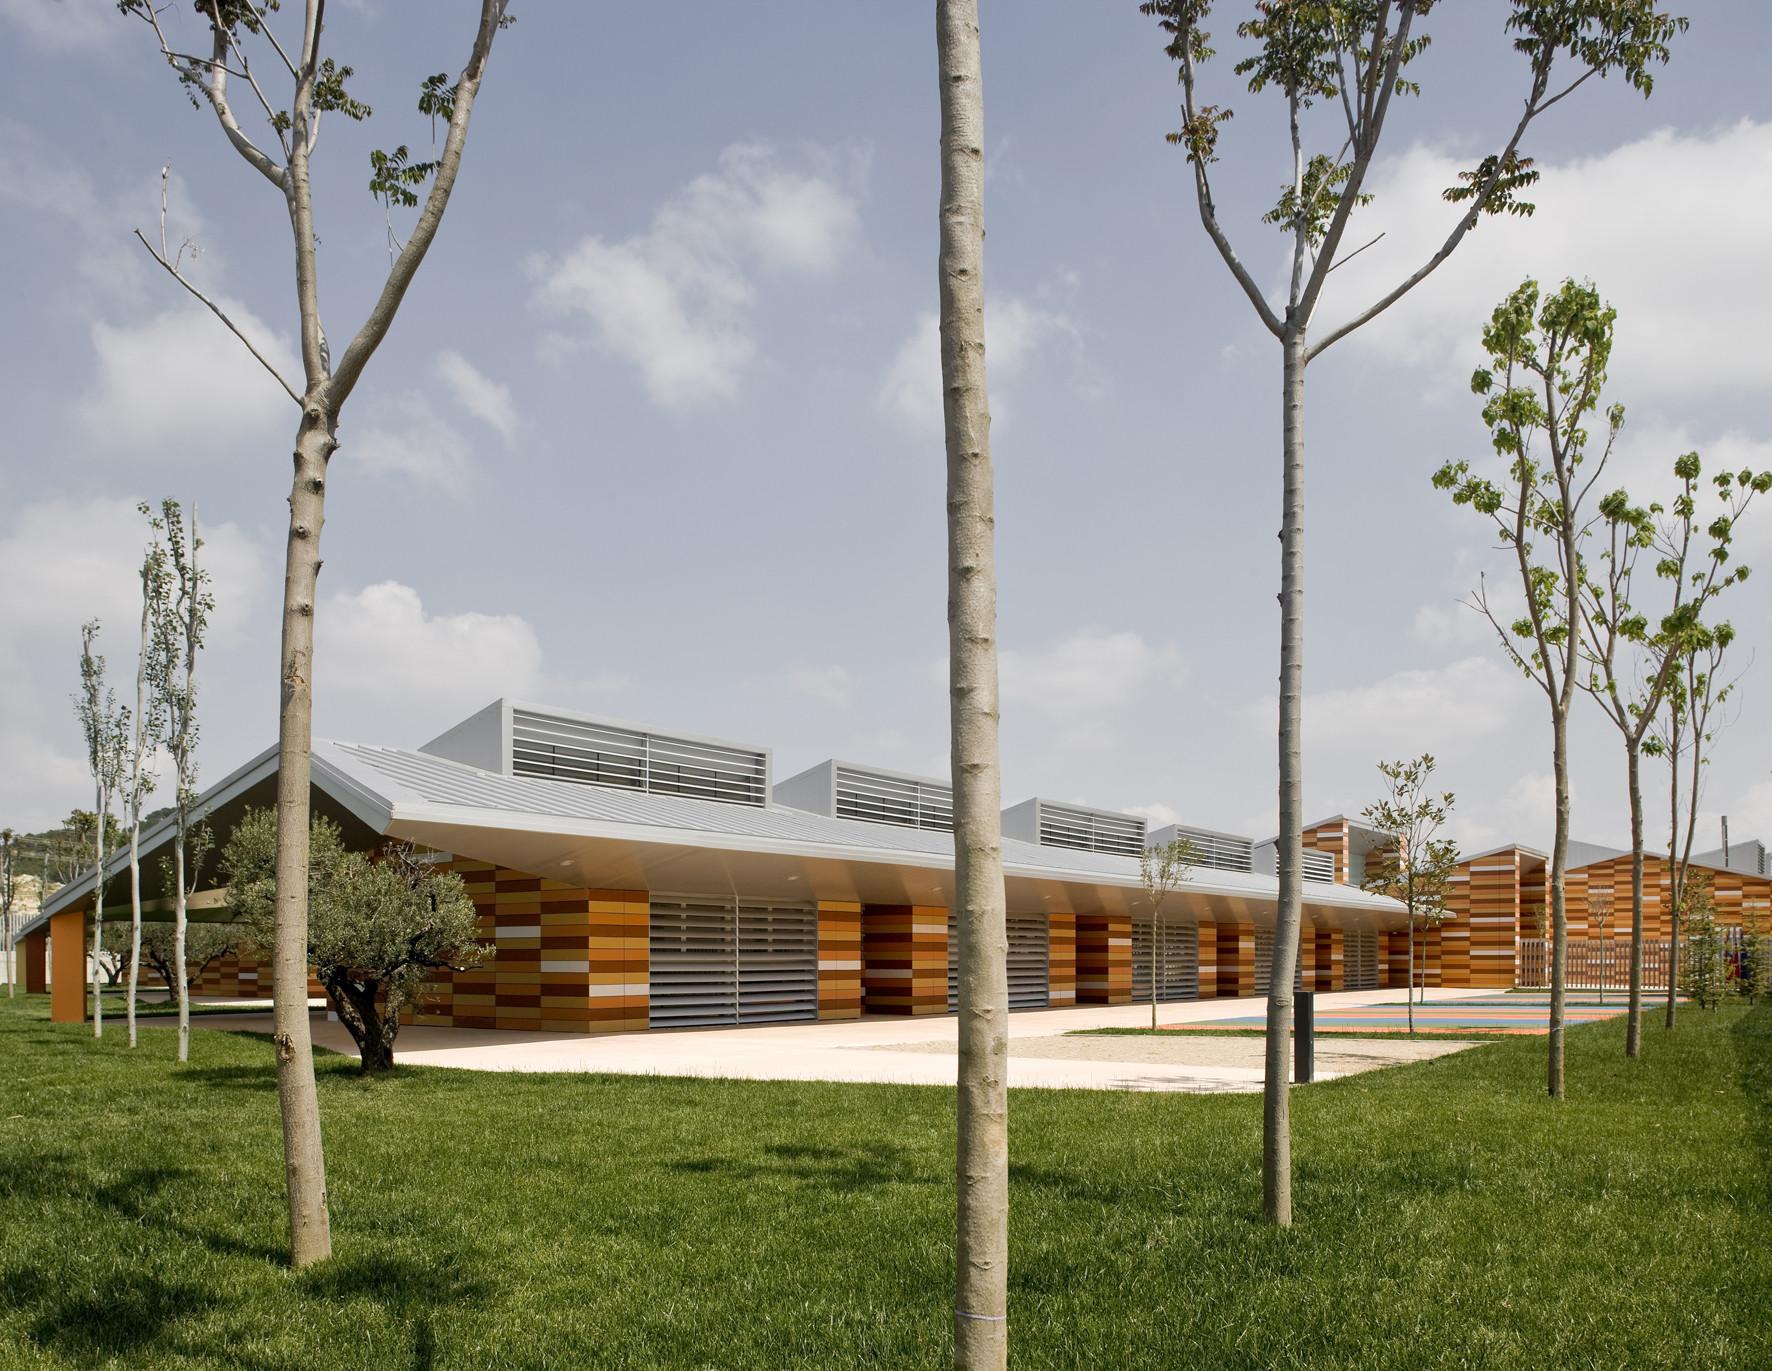 Parque Goya Kindergarten / Magén Arquitectos, © Pedro Pegenaute